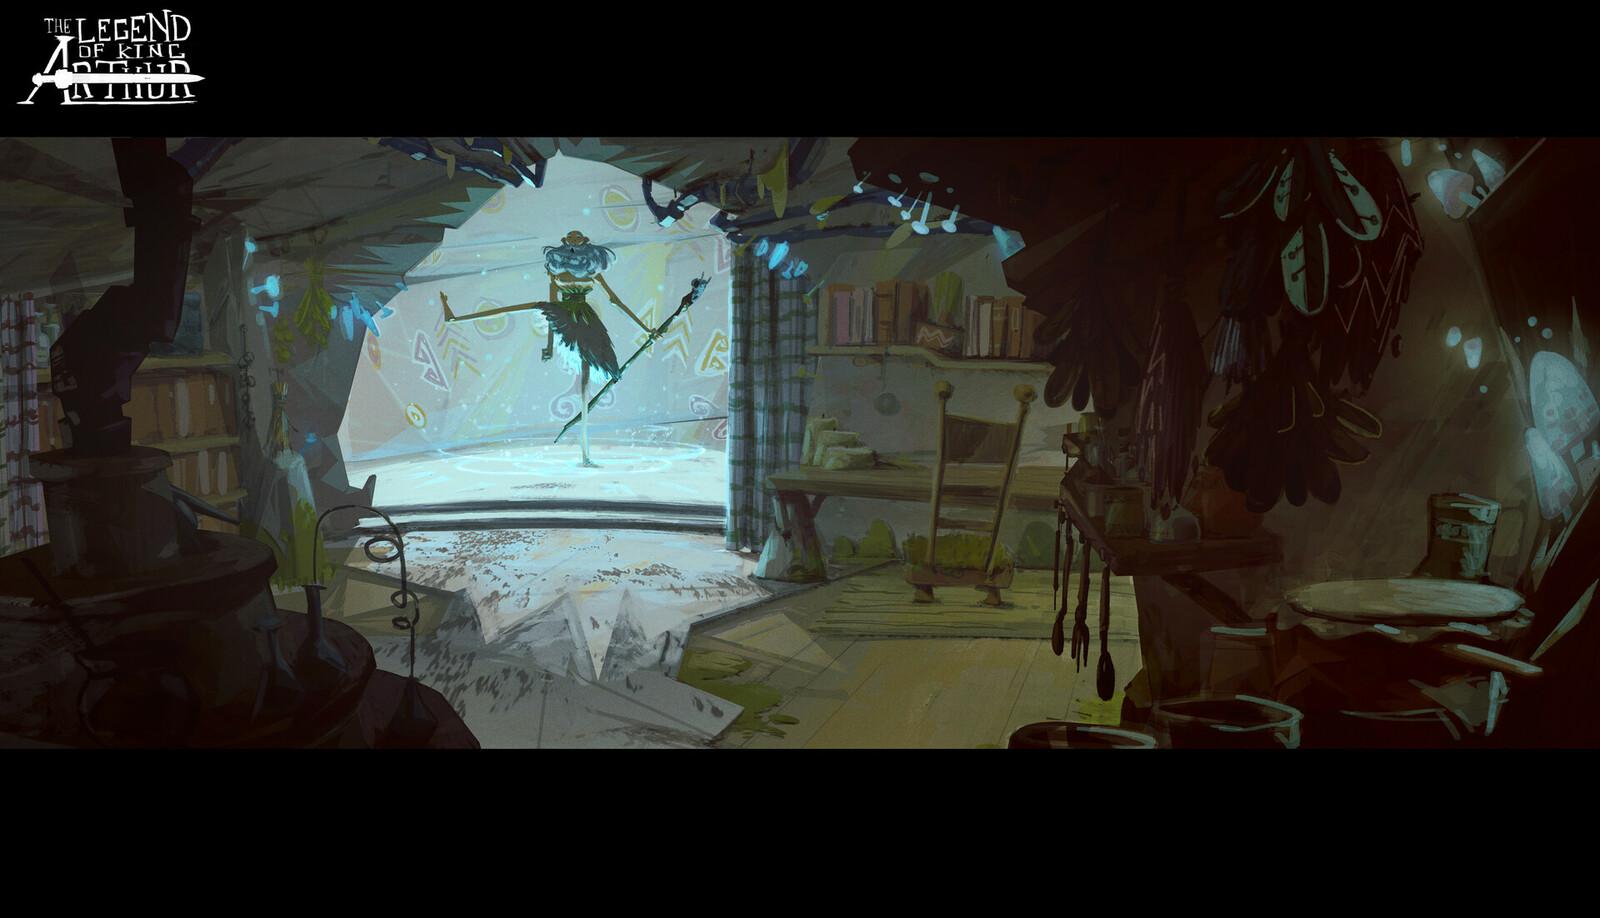 Final - Merlin's cave